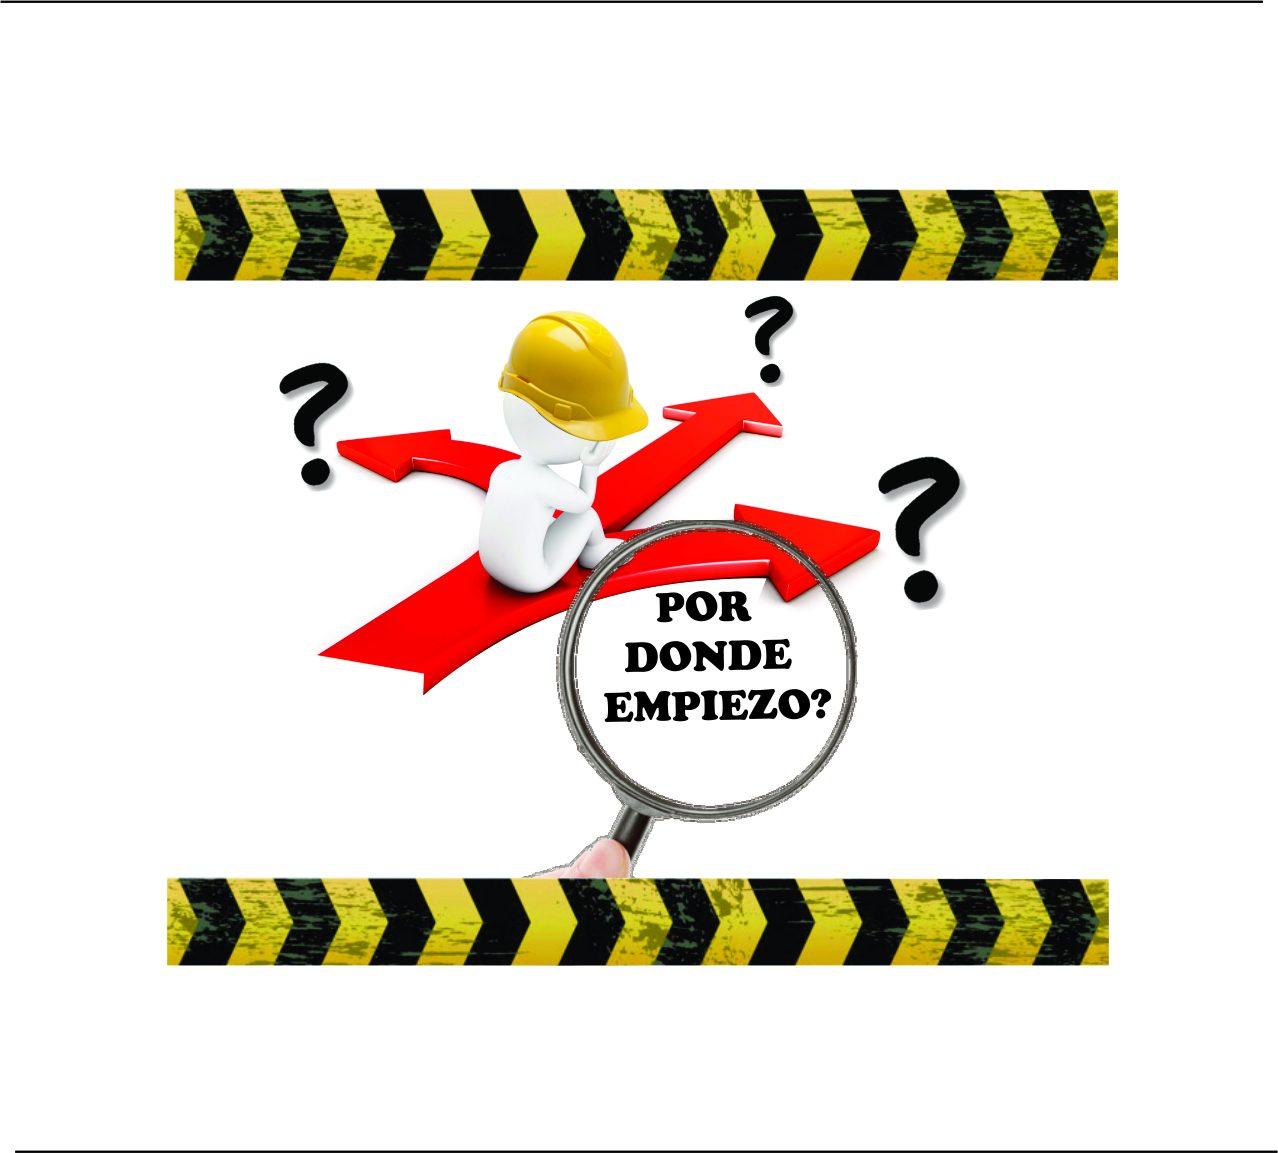 Como debes actuar antes de realizar labores de alto riesgo? Esquema a respetar para trabajar seguro